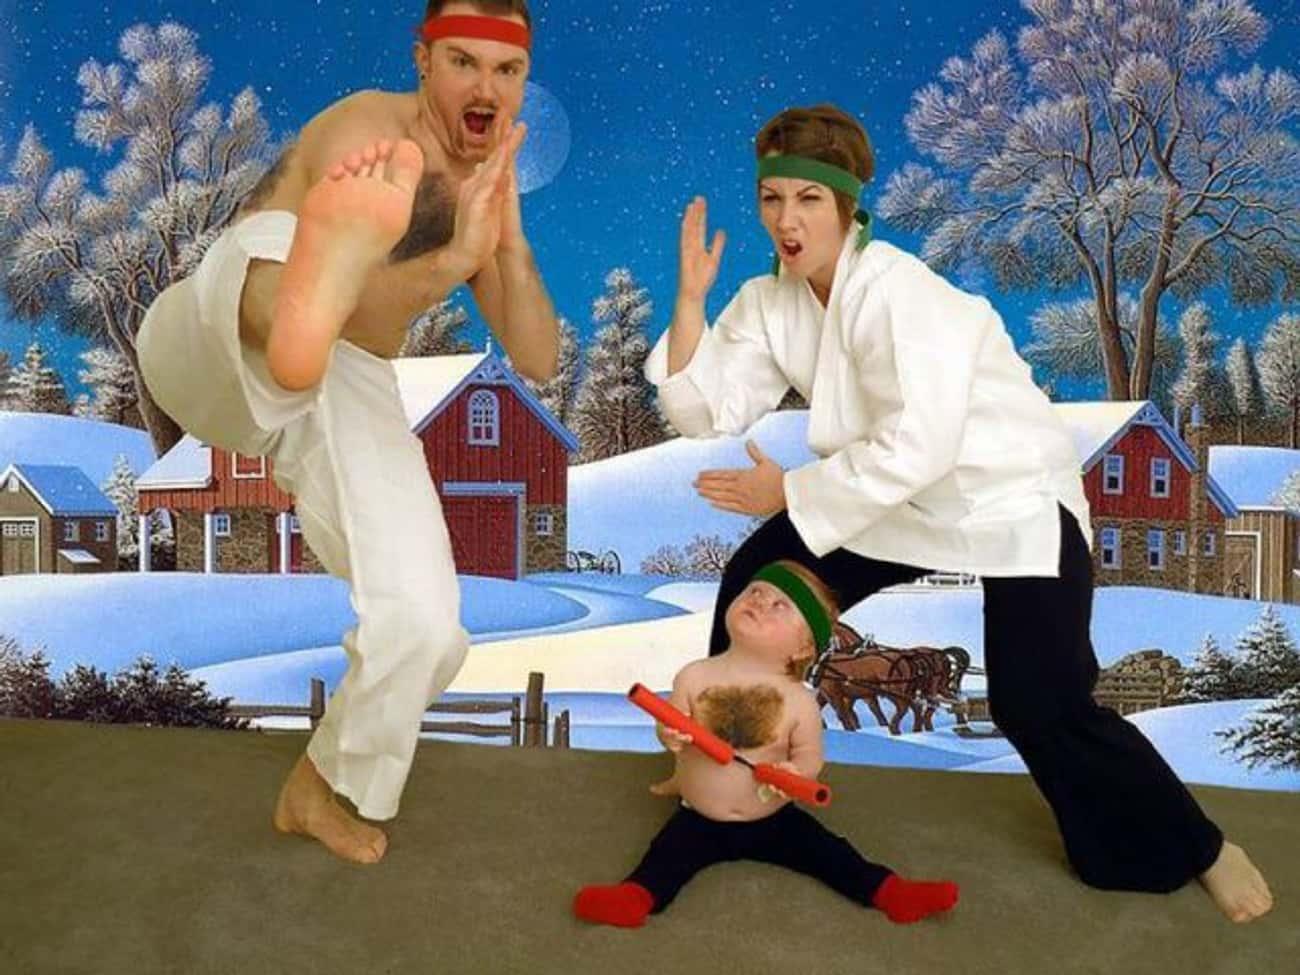 Christmas Ninja Roundhouse Kic is listed (or ranked) 4 on the list Awkwardly Hilarious Family Christmas Photos